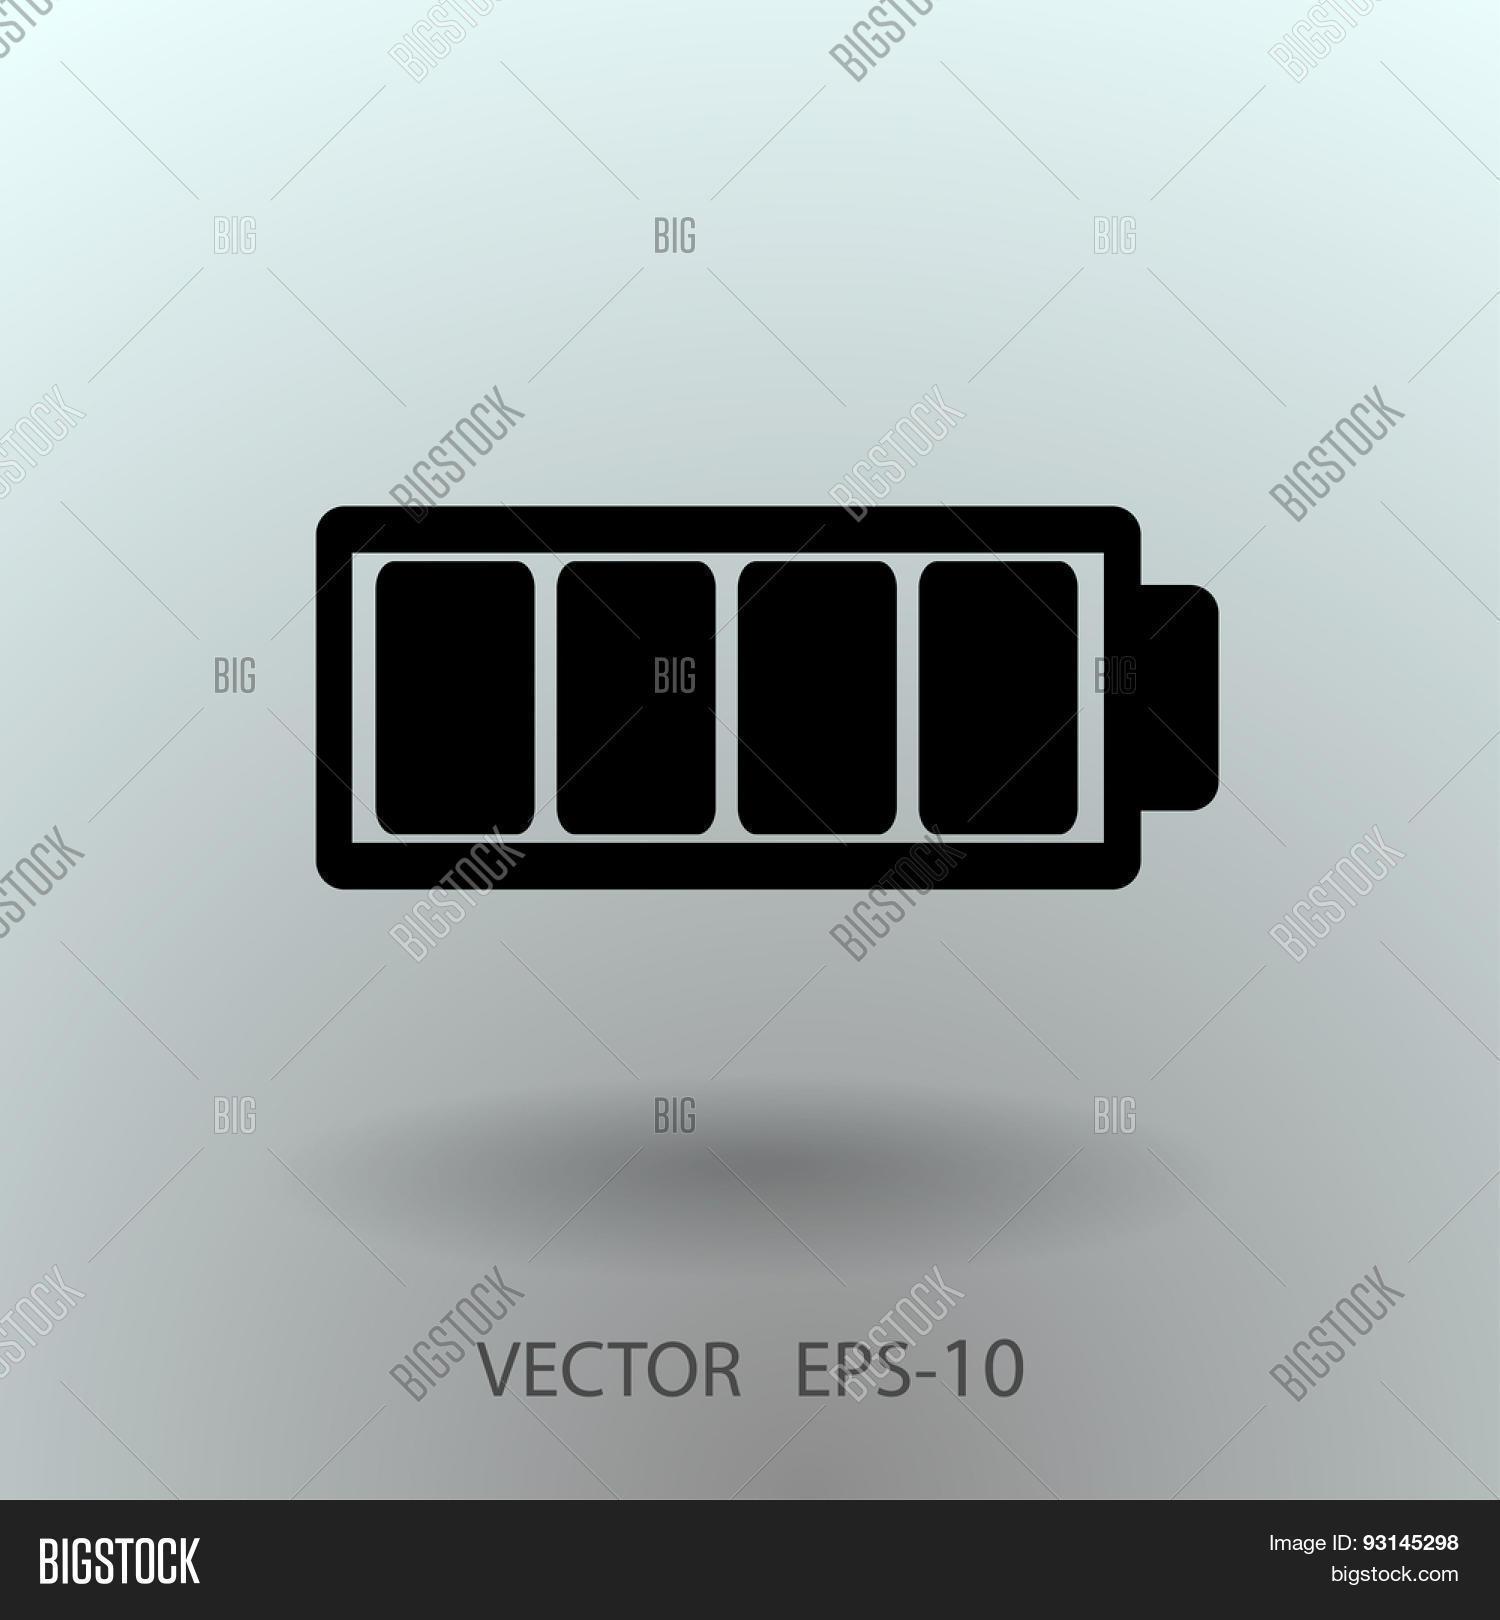 Flat Battery Full Vector & Photo (Free Trial) | Bigstock